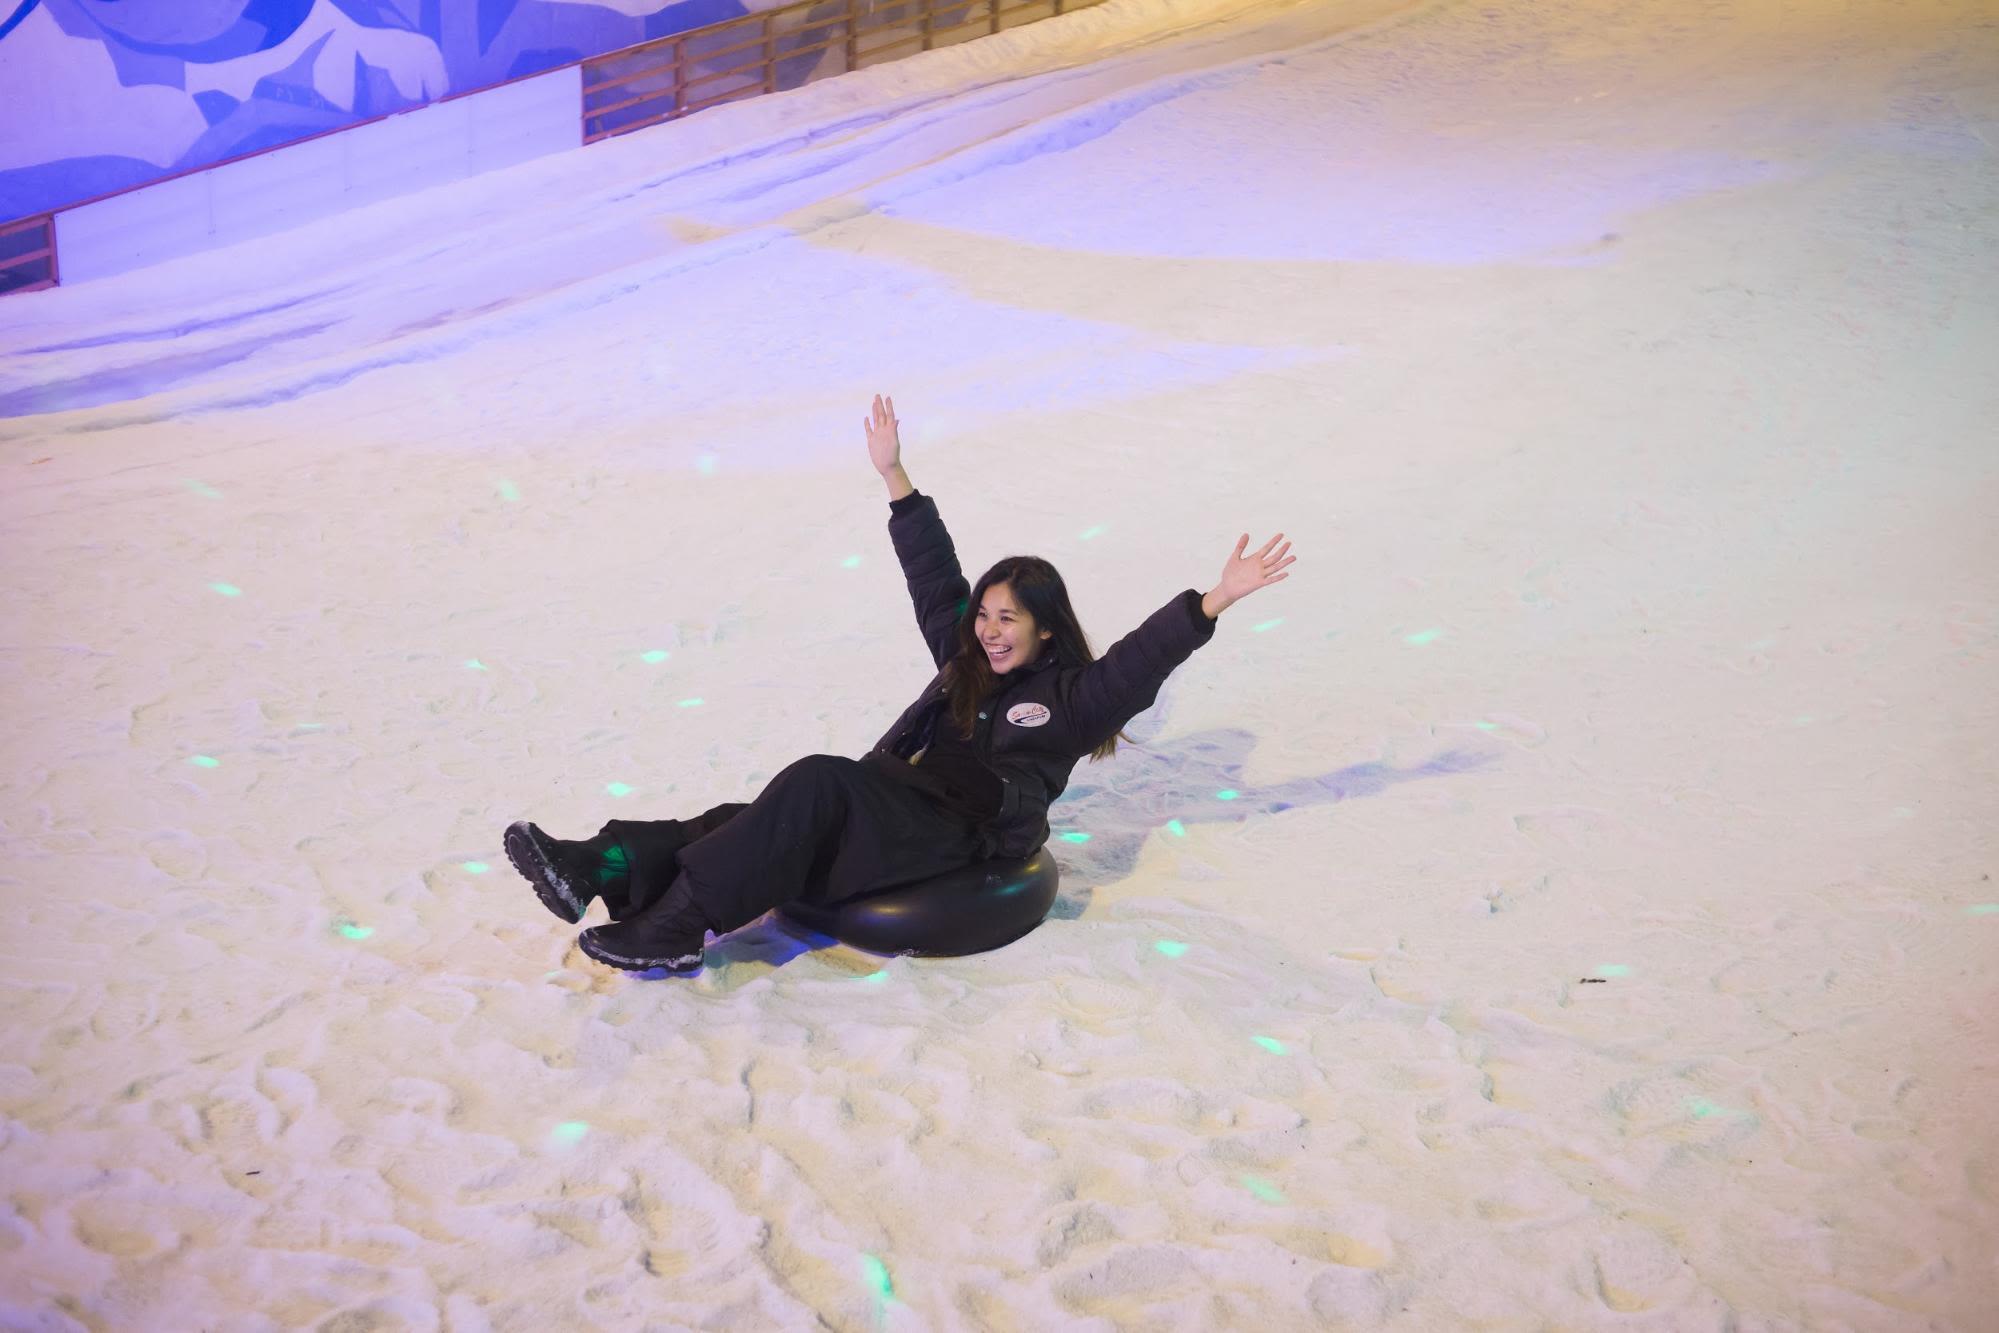 vui chơi ở snow city, phía tây singapore